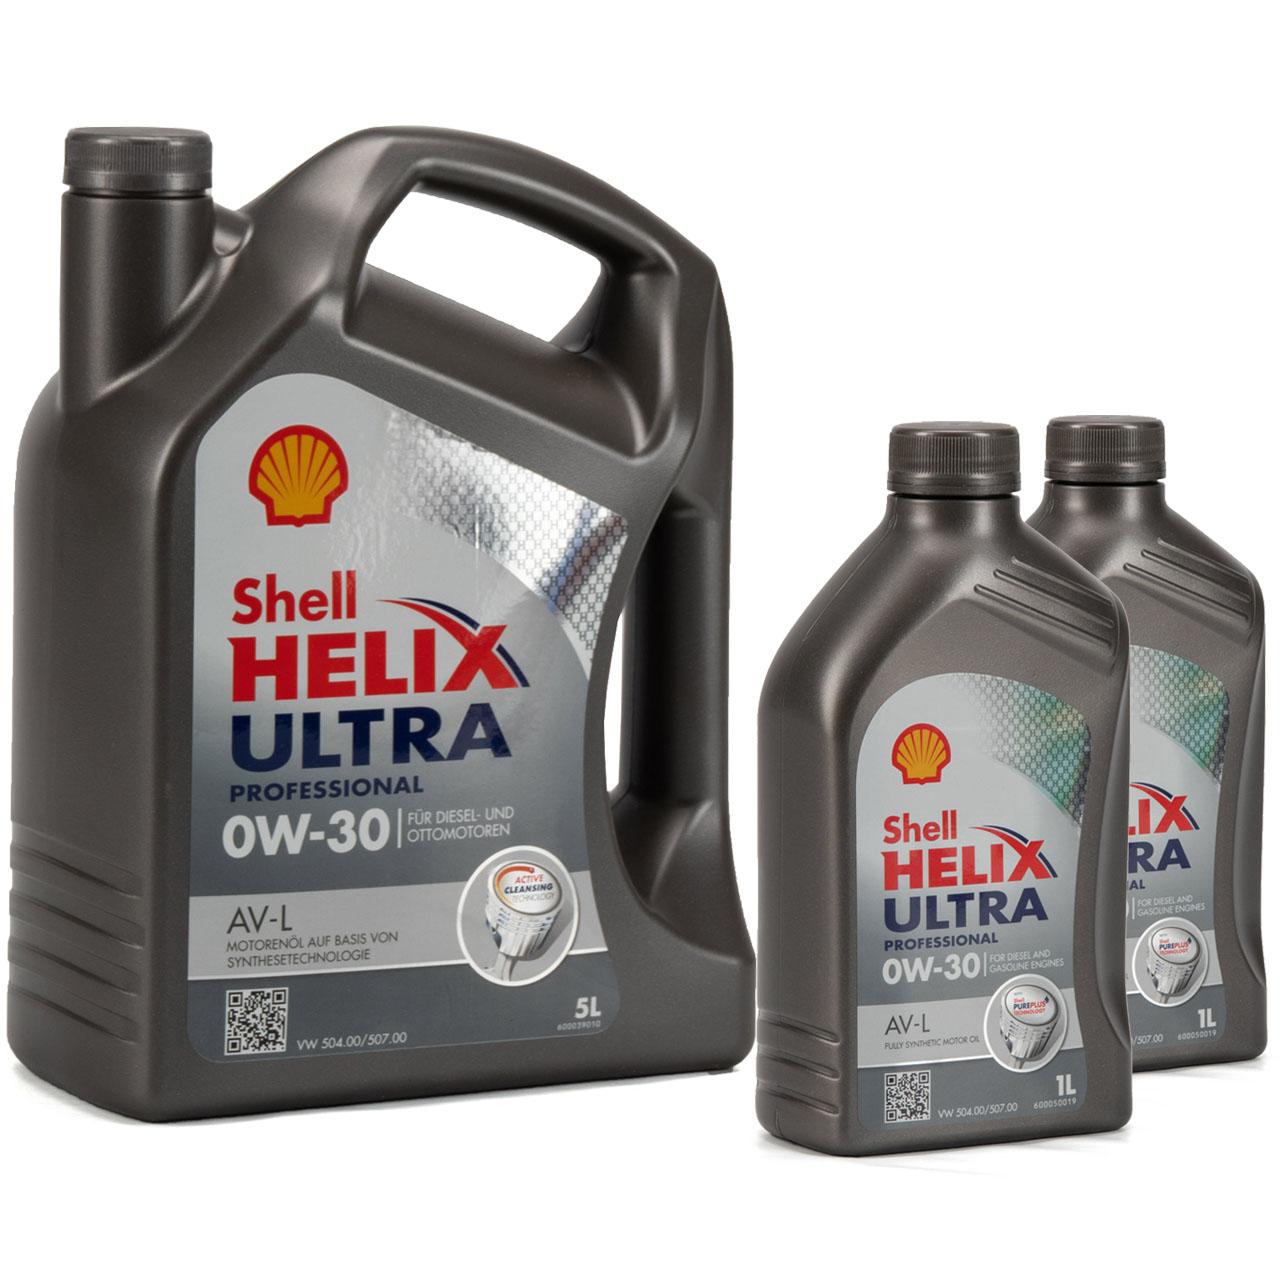 SHELL Motoröl Öl HELIX ULTRA Professional AV-L 0W30 VW 504.00/507.00 - 7 Liter